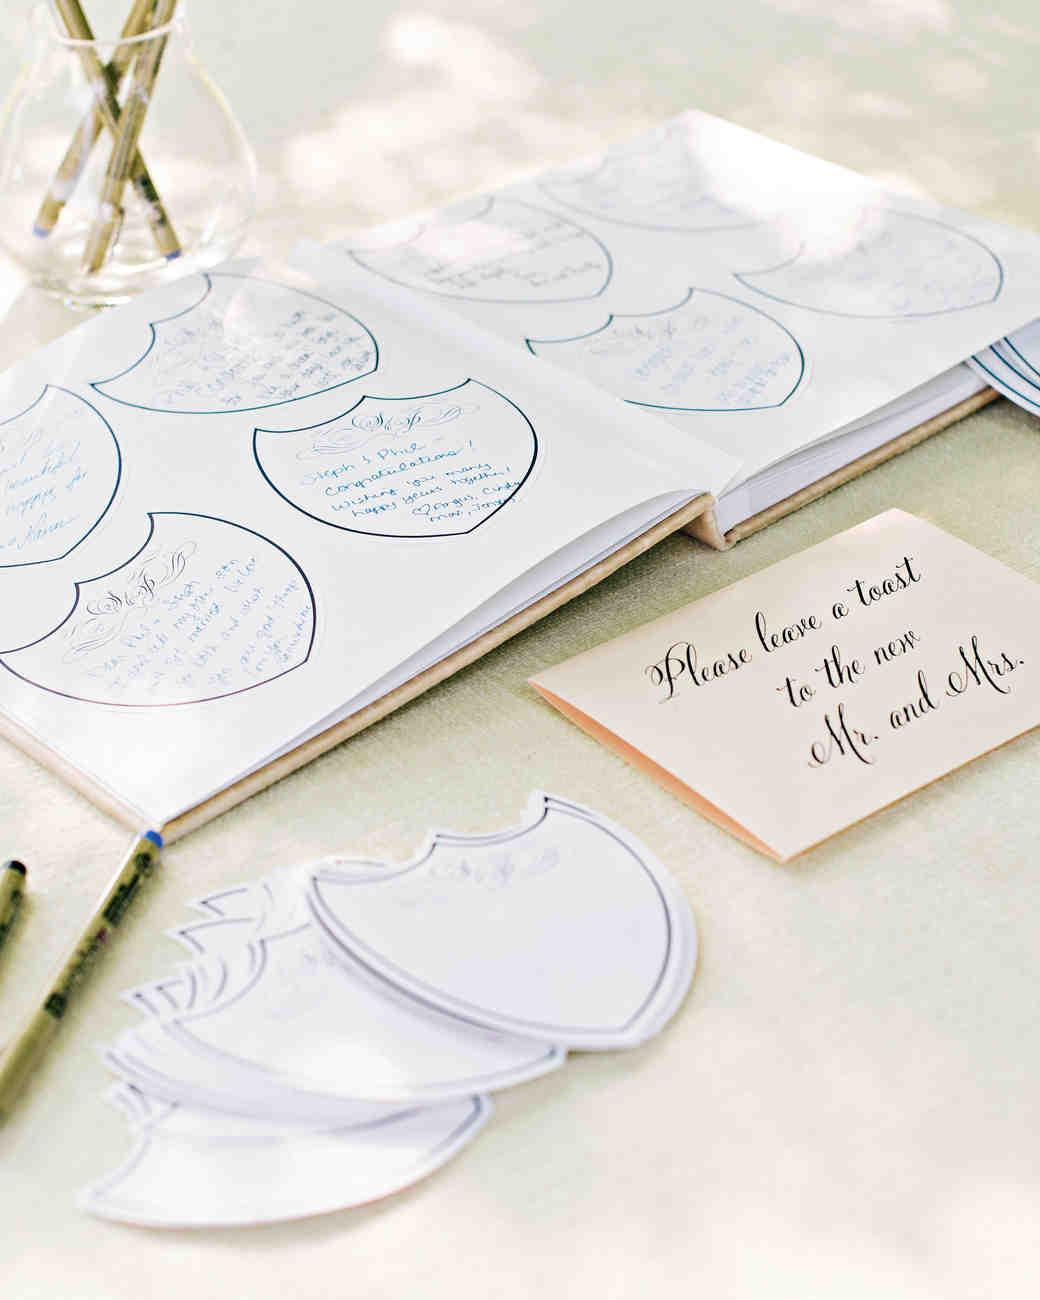 Diy wedding photo album ideas